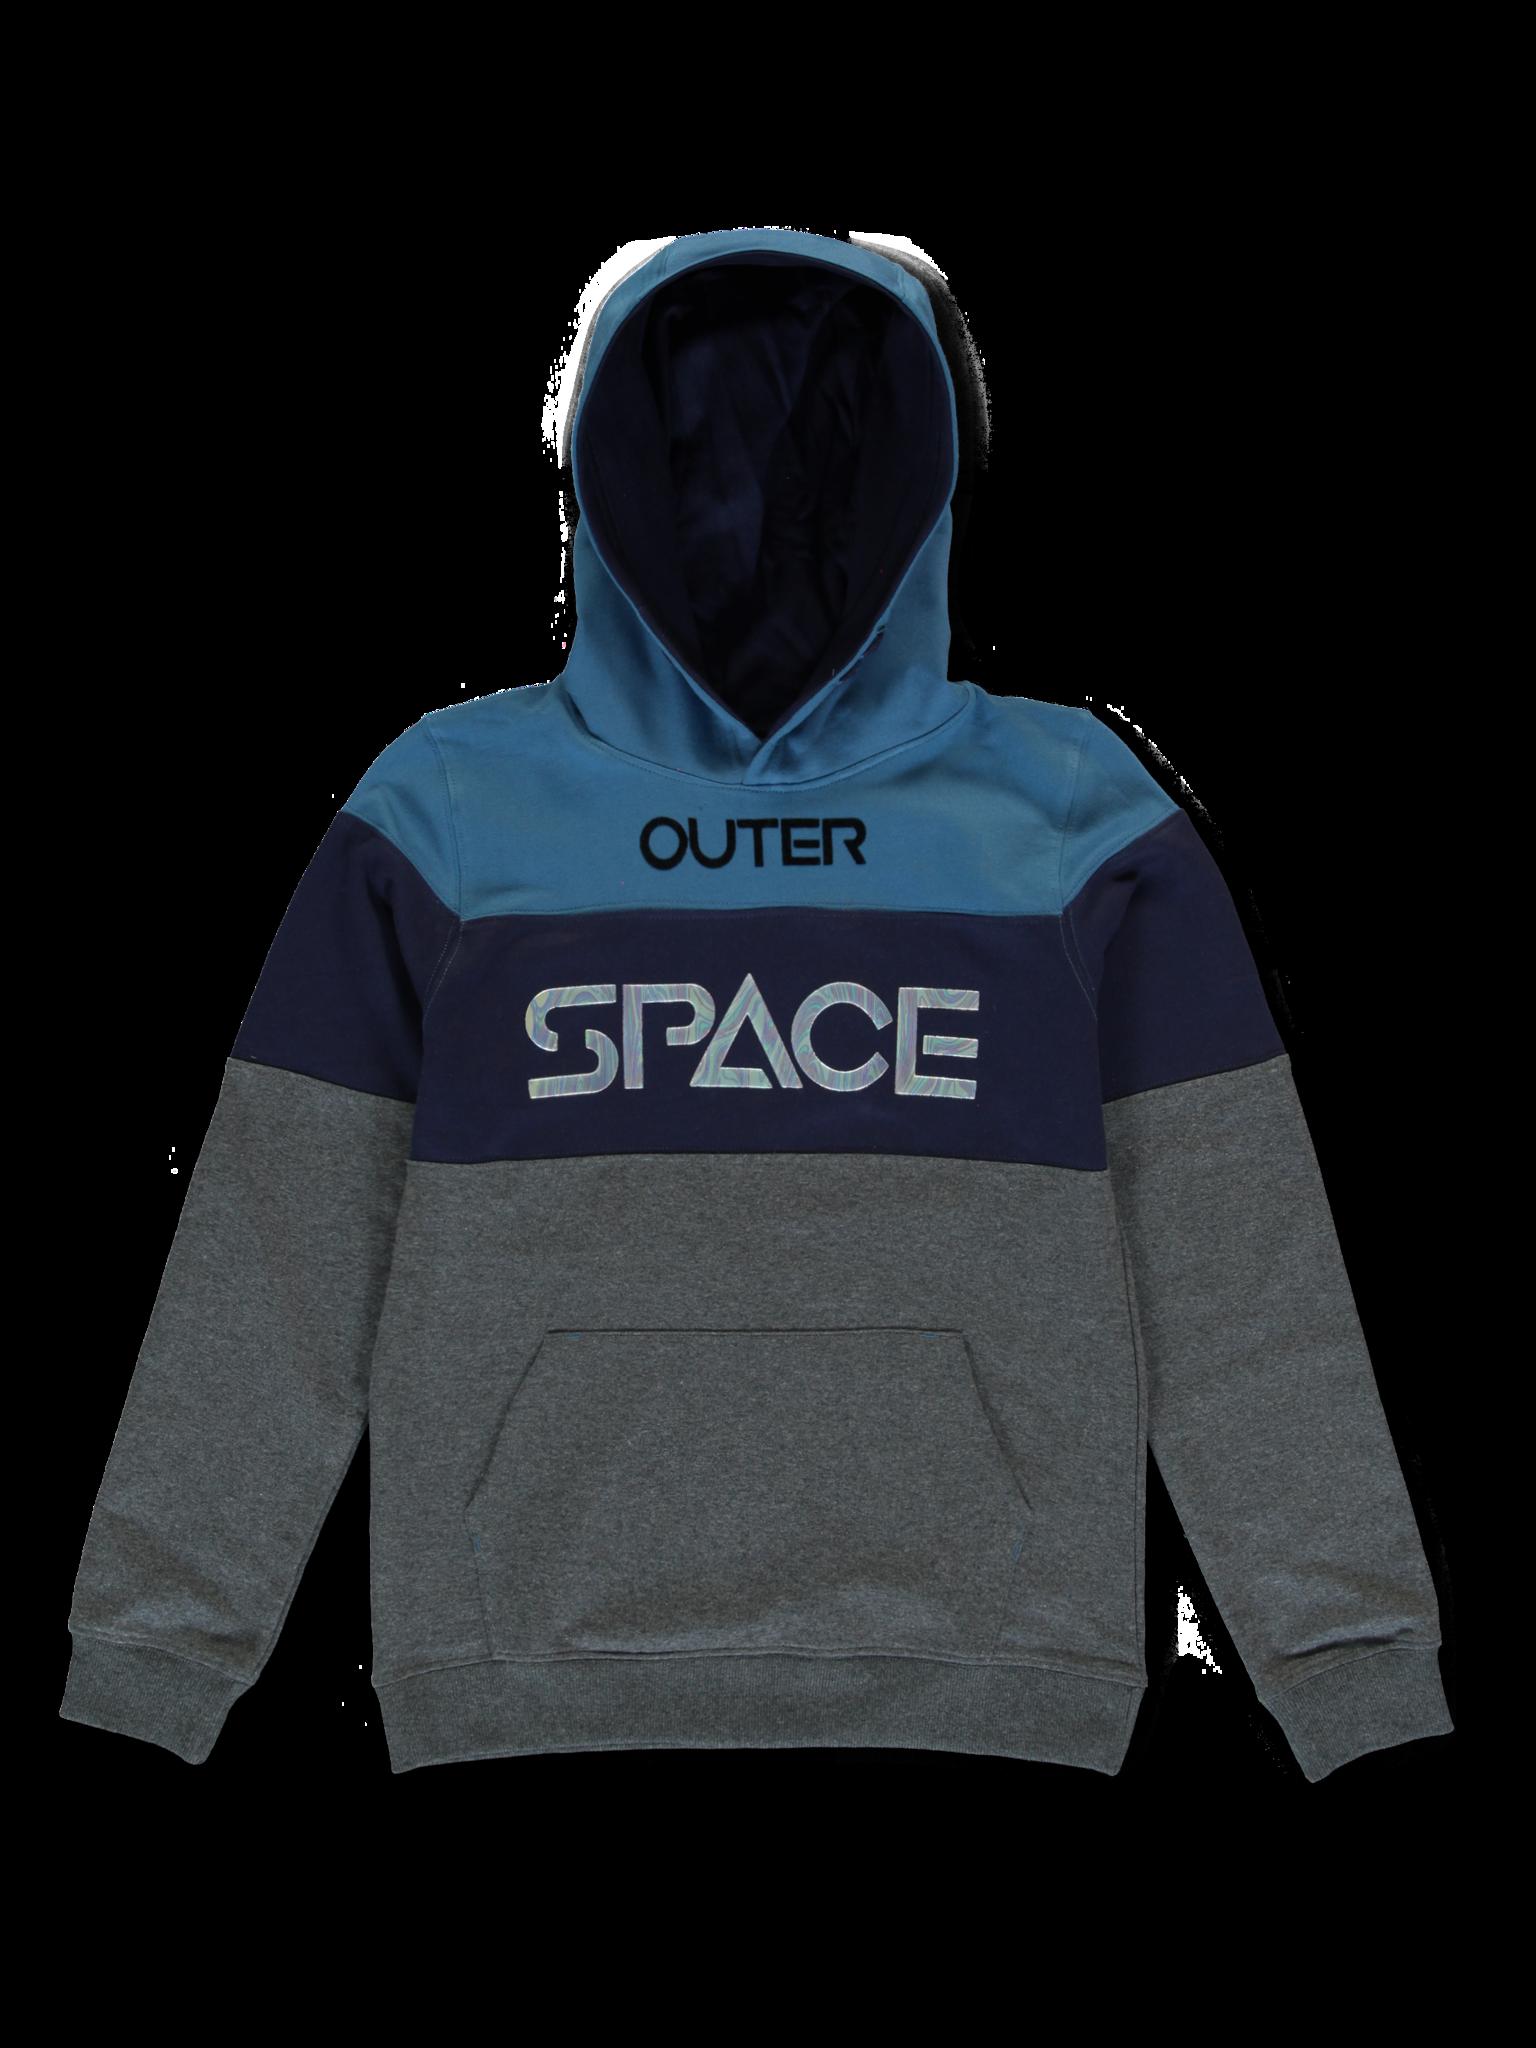 All Brands | Winterproducts Teen Boys | Sweatshirt | 12 pcs/box